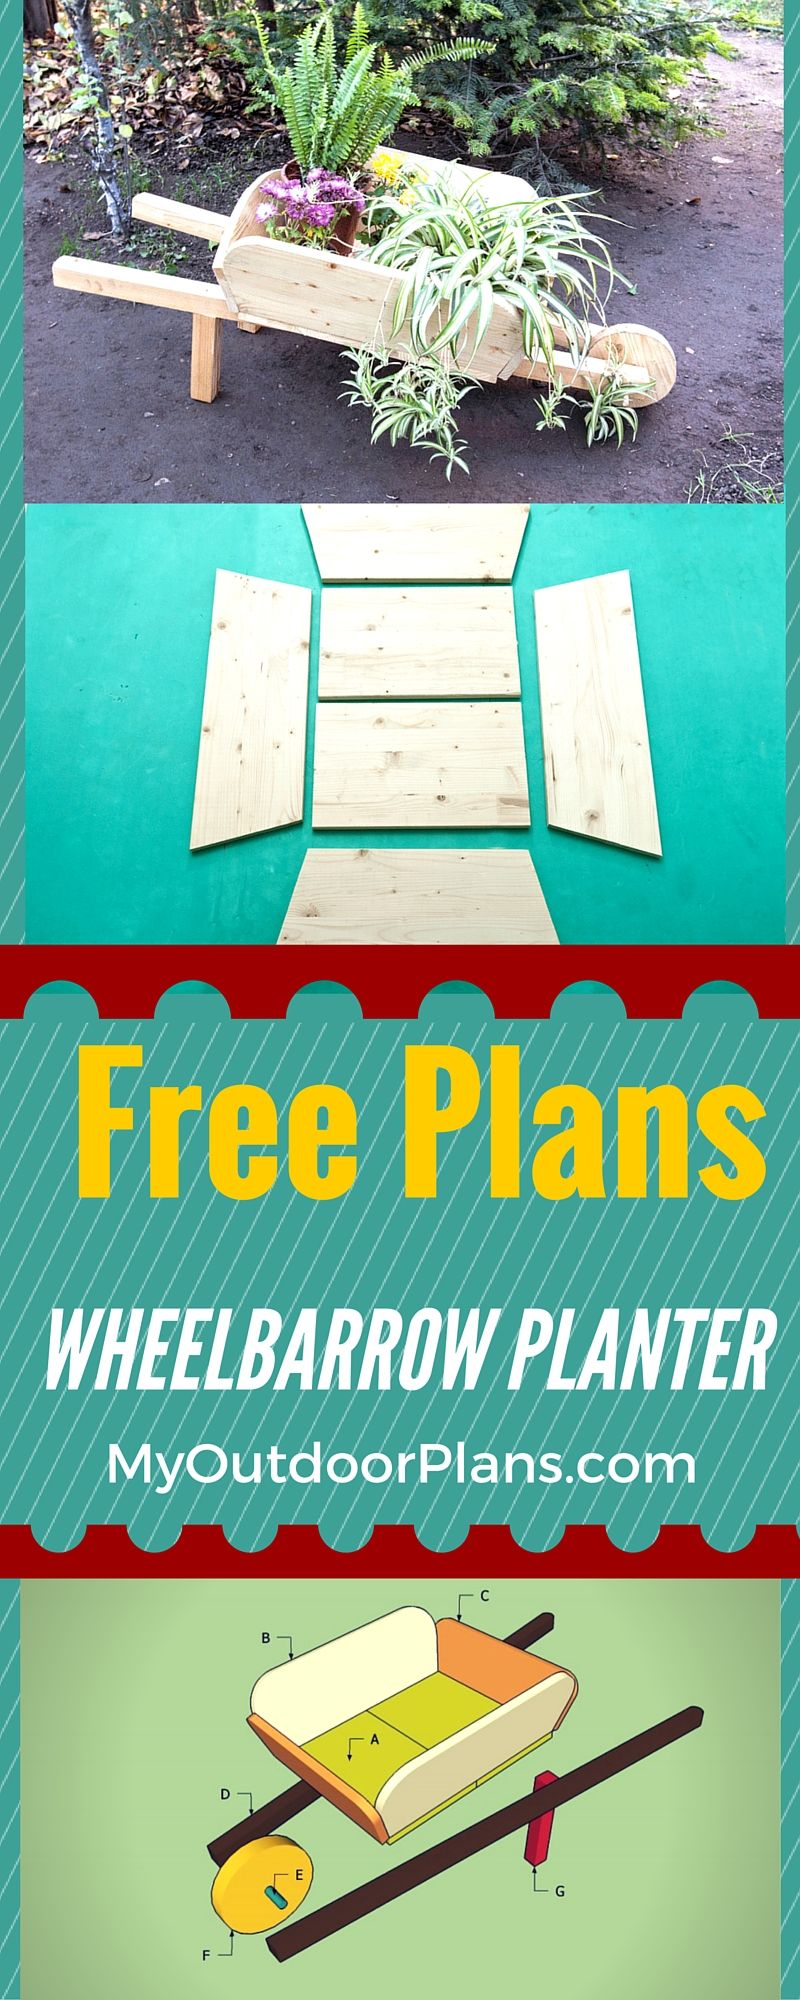 hight resolution of how to build a wheelbarrow planter easy to follow plans for building a wood wheelbarrow planter for your garden in just a few hours howtospecialist com